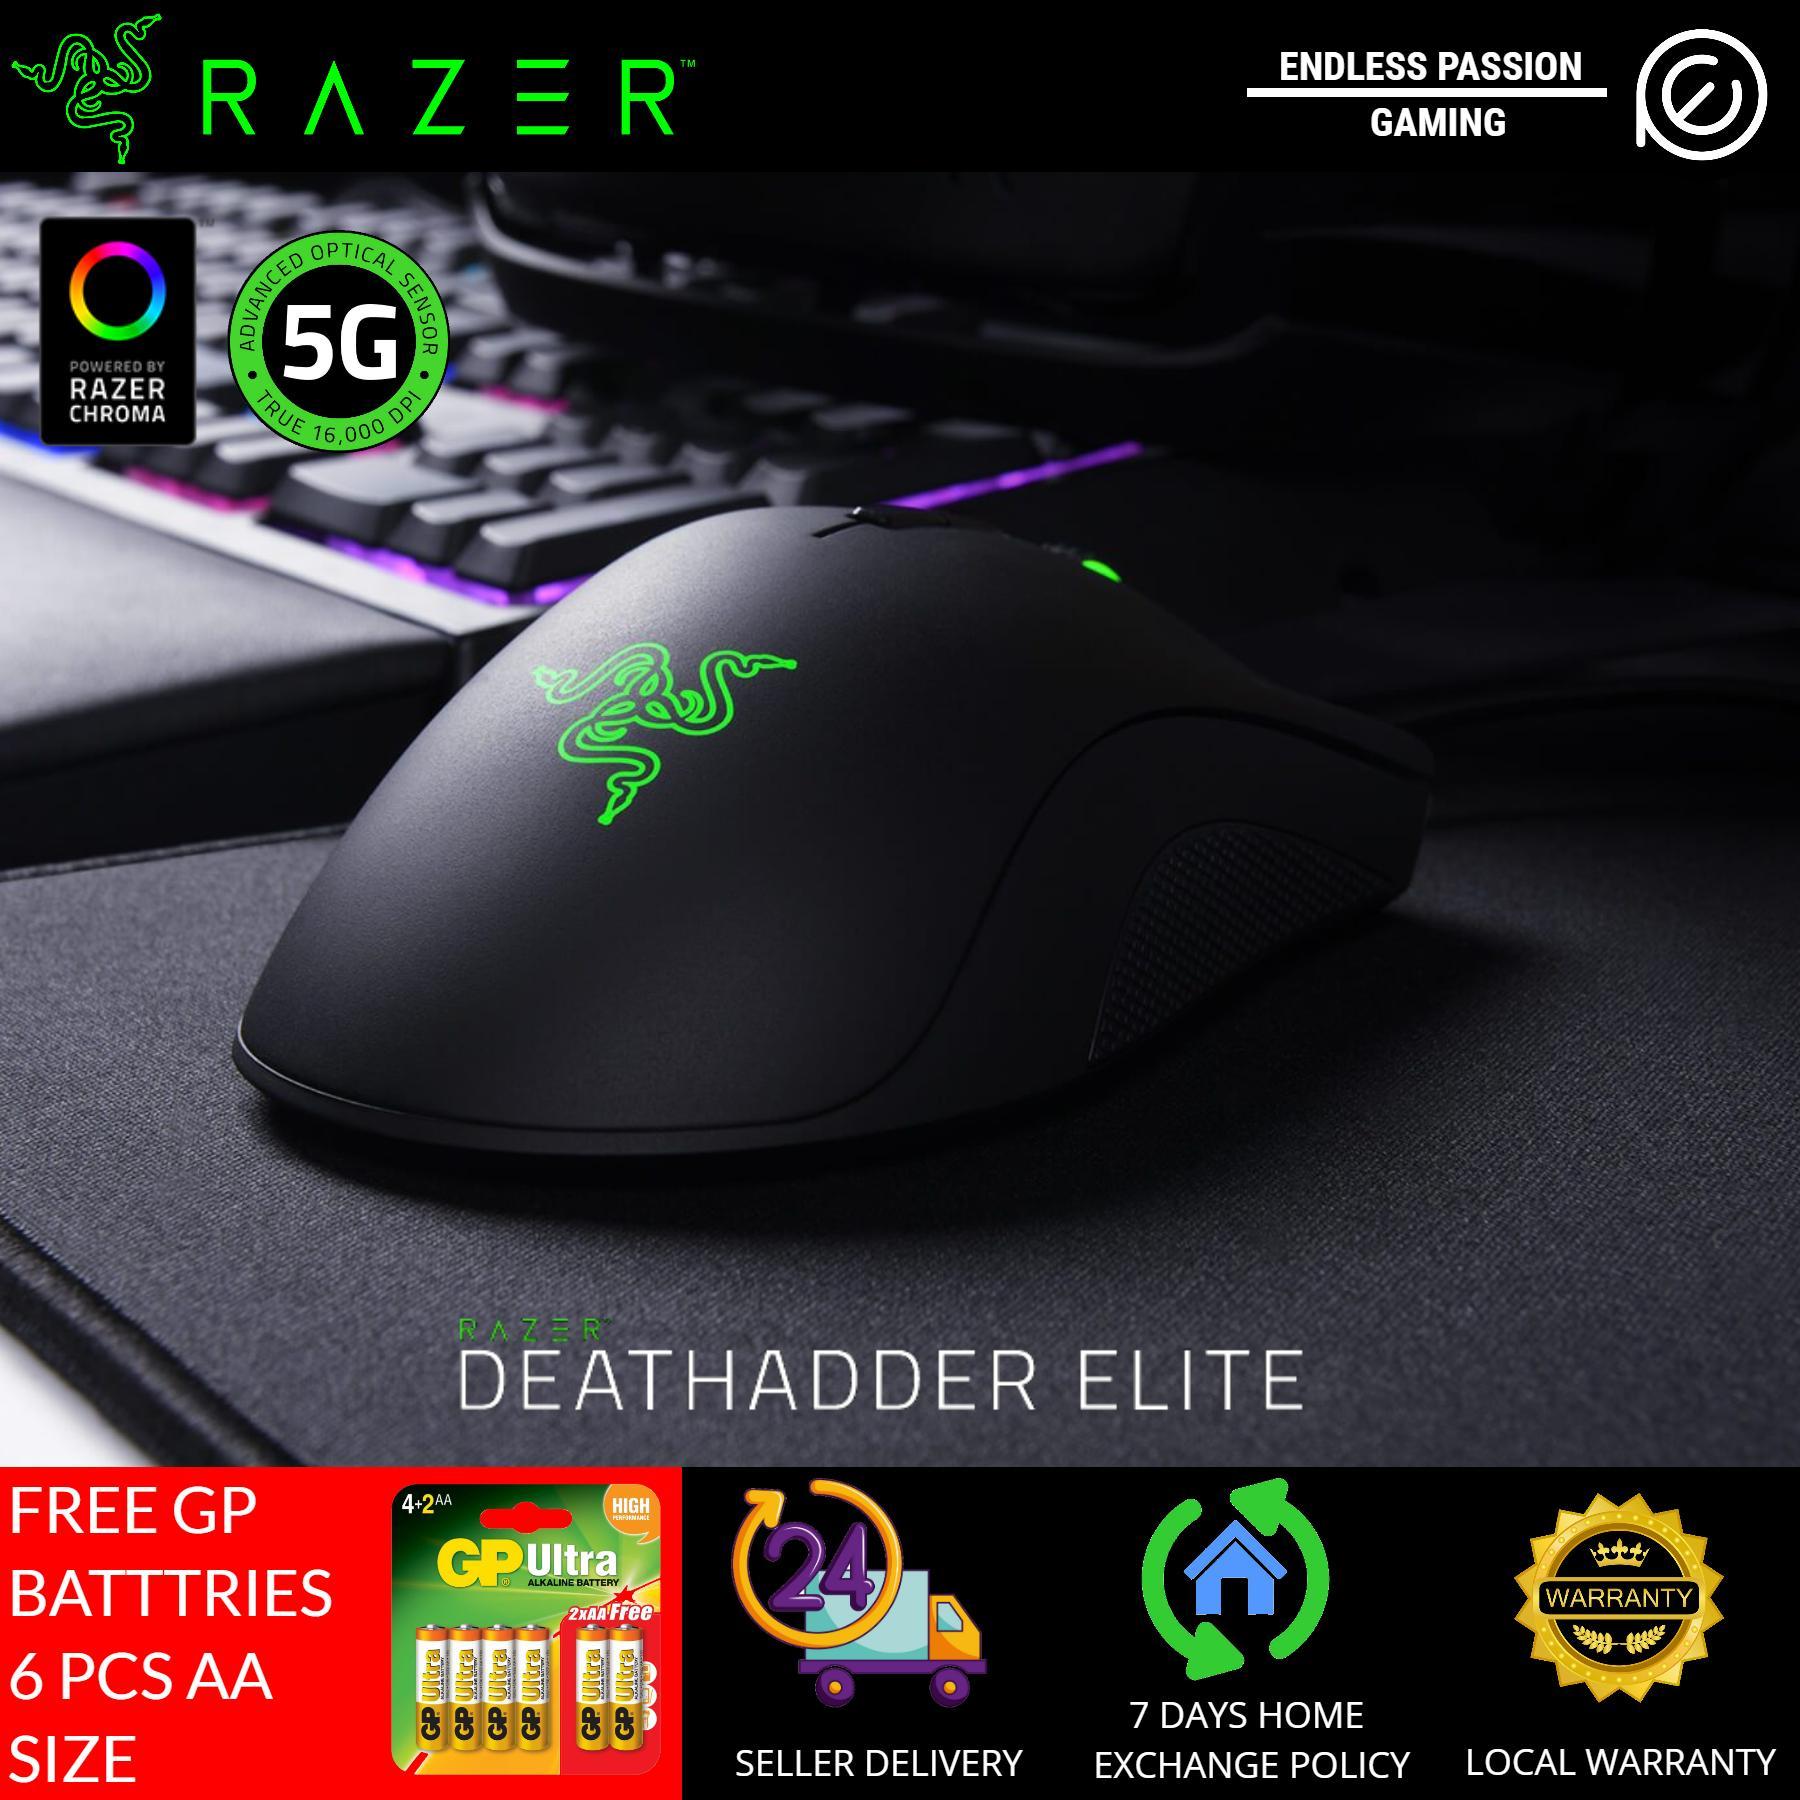 ae3aef844a3 Razer DeathAdder Elite Ergonomic Gaming Mouse